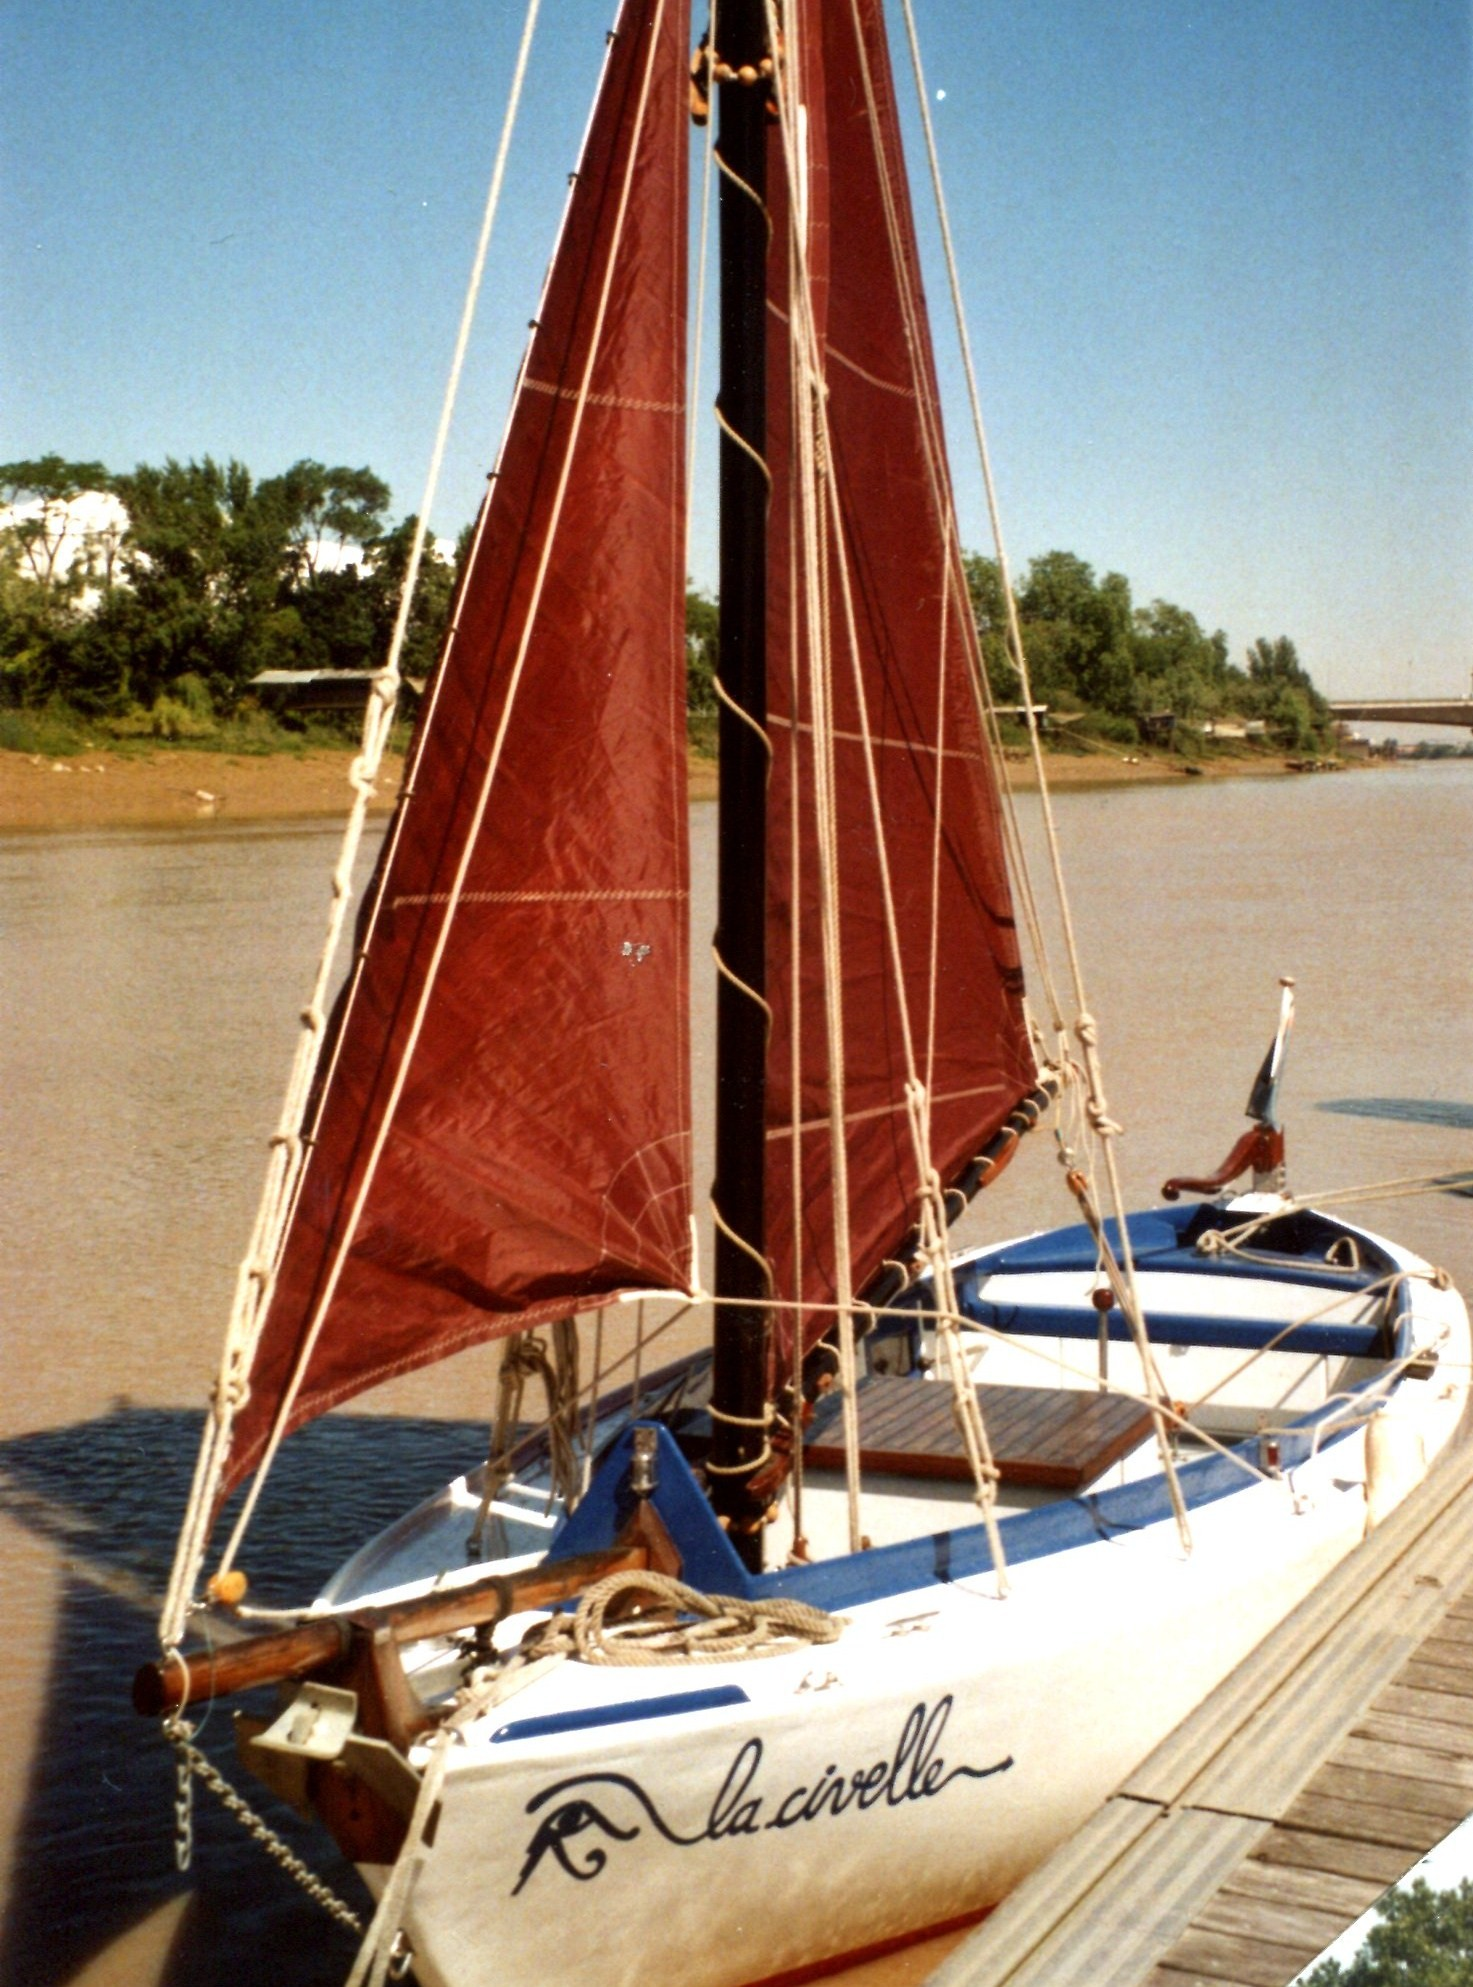 Yole estuarienne typique de Gironde